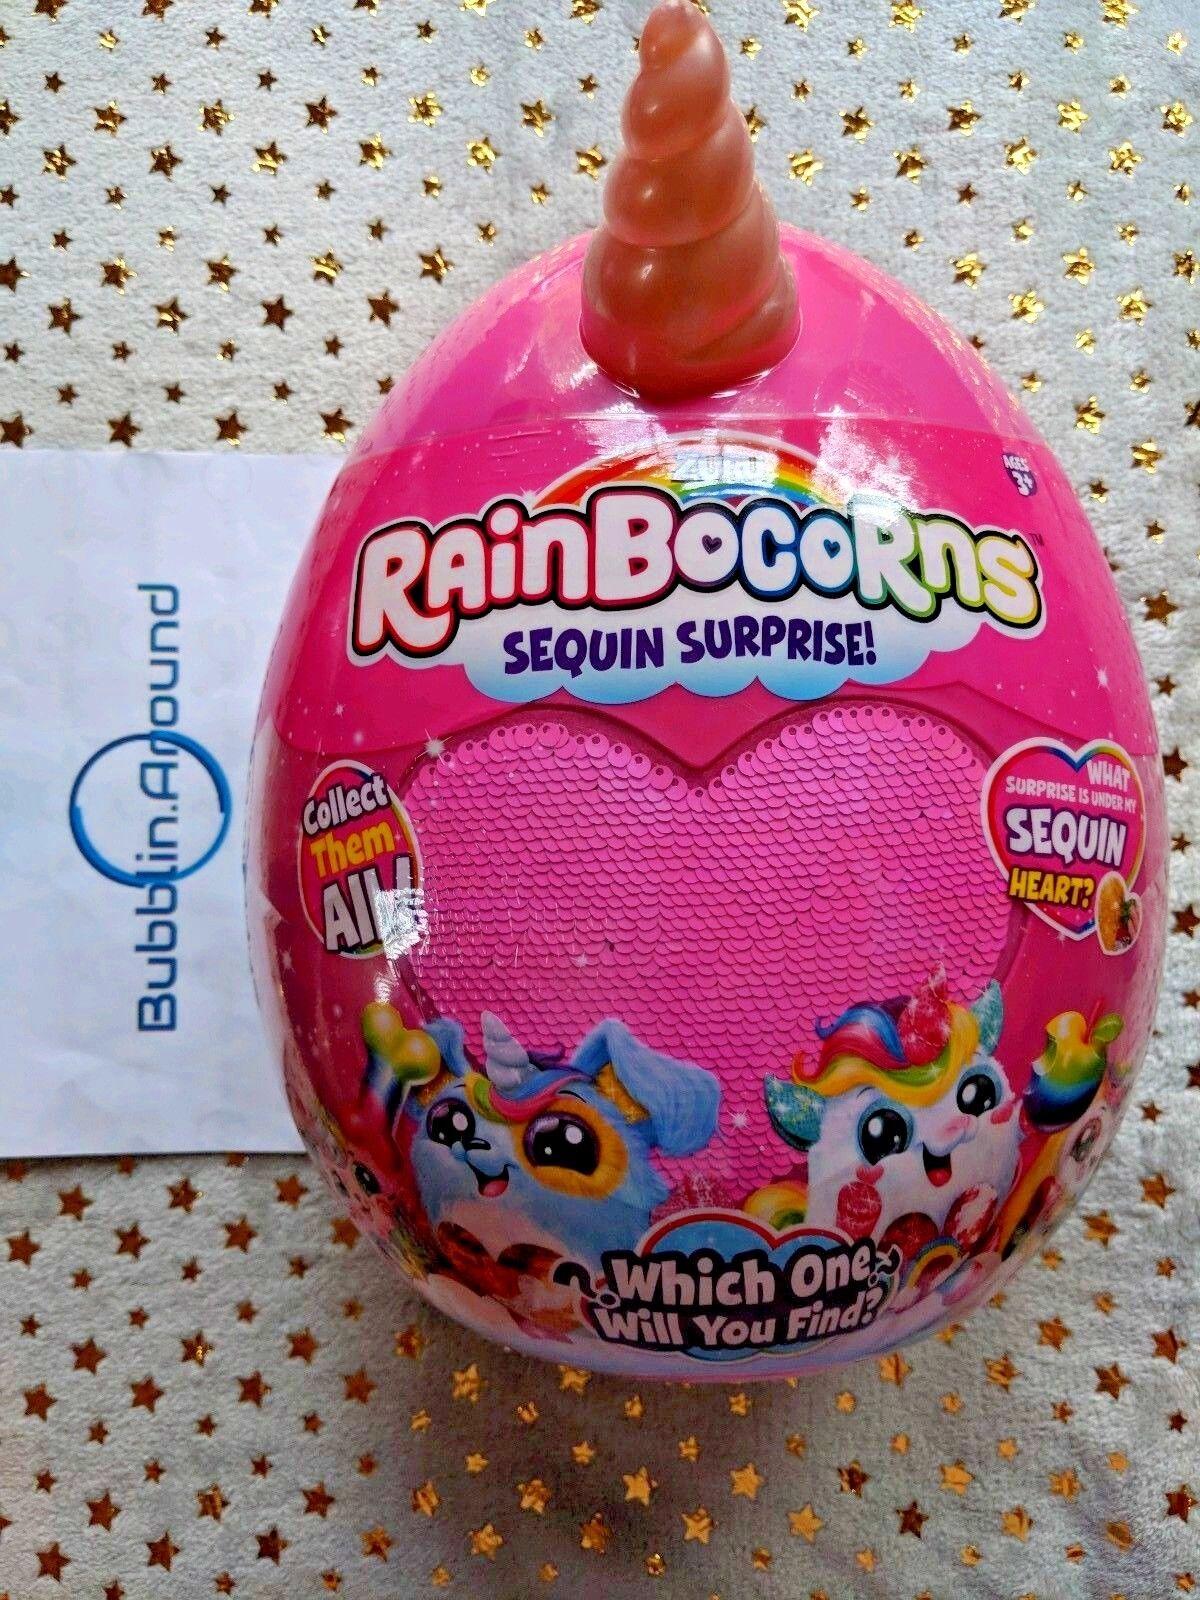 Rainbocorns Sequin Surprise - Gigi - Rosa Kitty Rainbocorn